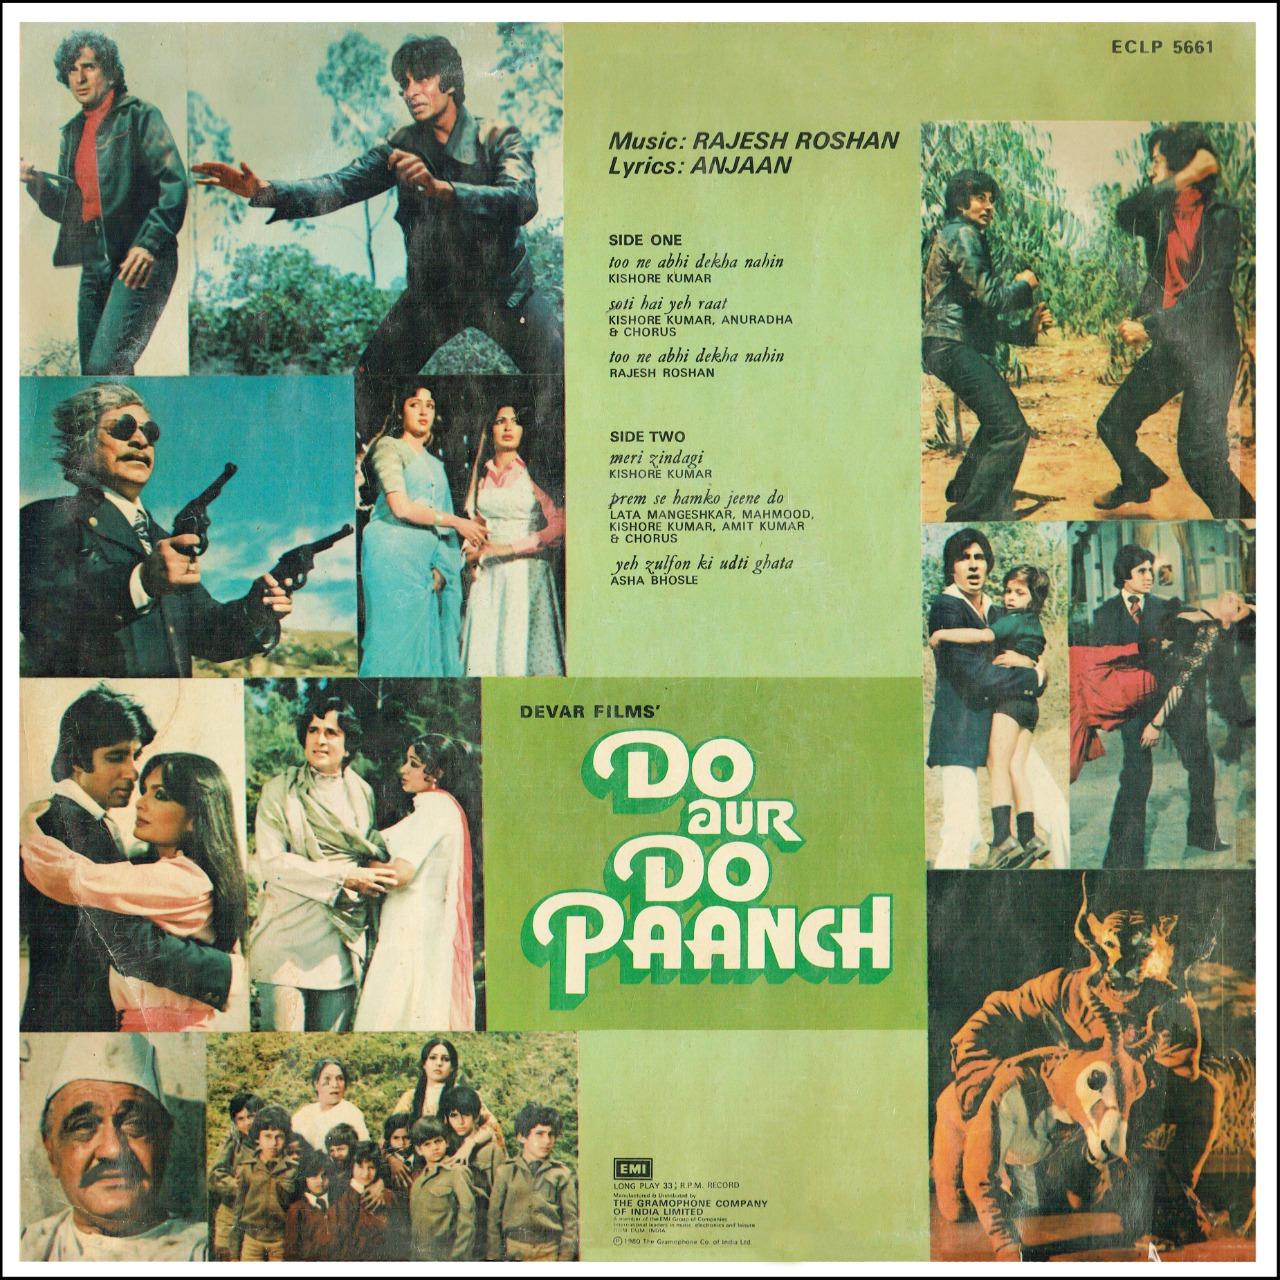 Do Aur Do Paanch - ECLP 5661 - (Condition 80-85%) - Cover Reprinted - LP Record